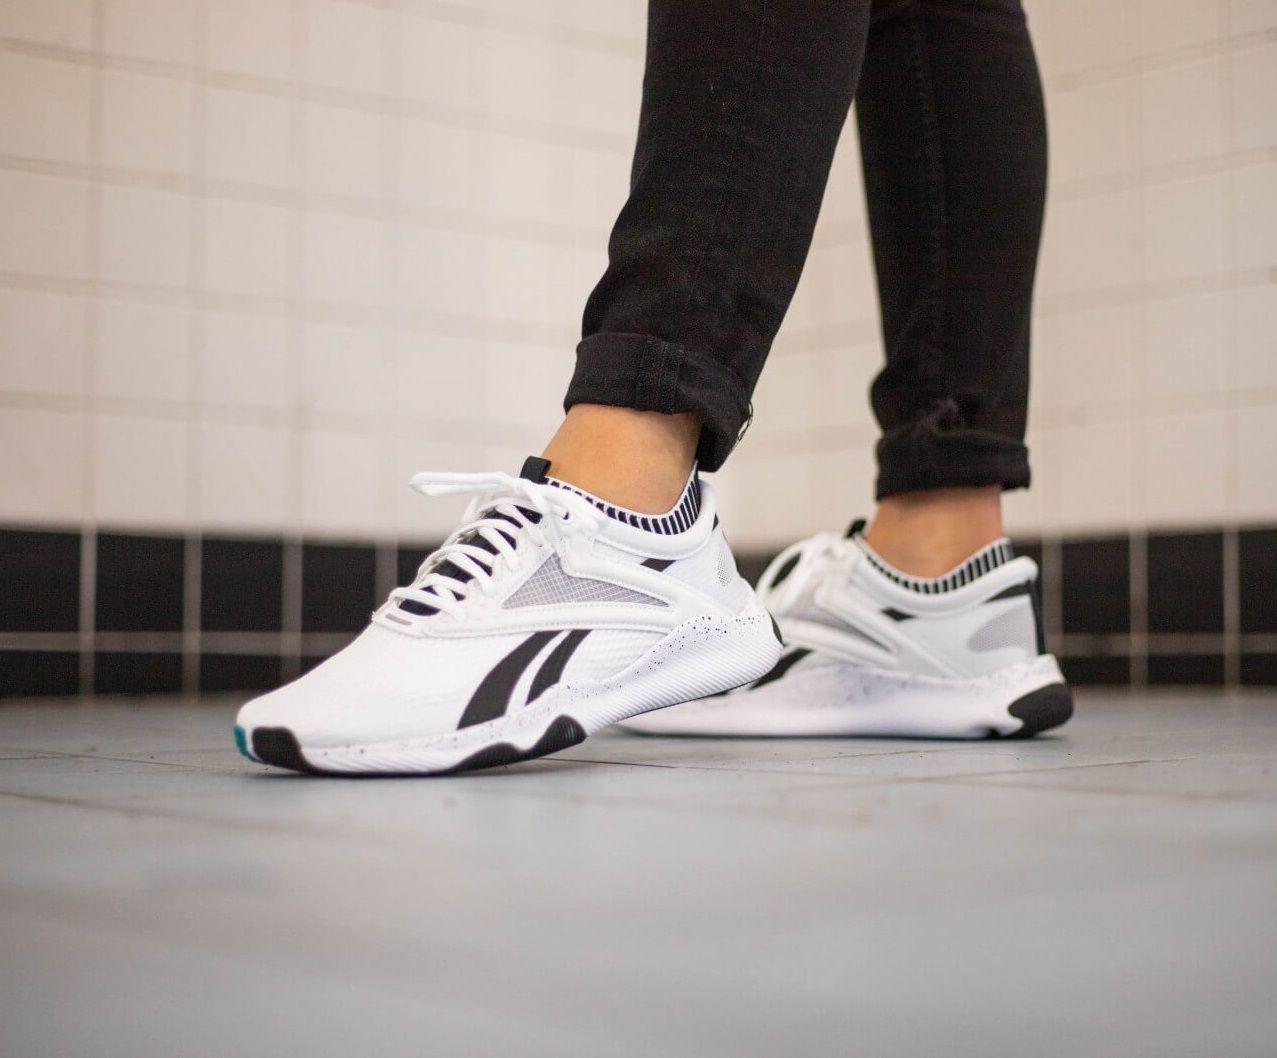 Reebok-HIIT-Training-Shoe-1 +80 Most Inspiring Workout Shoes Ideas for Women